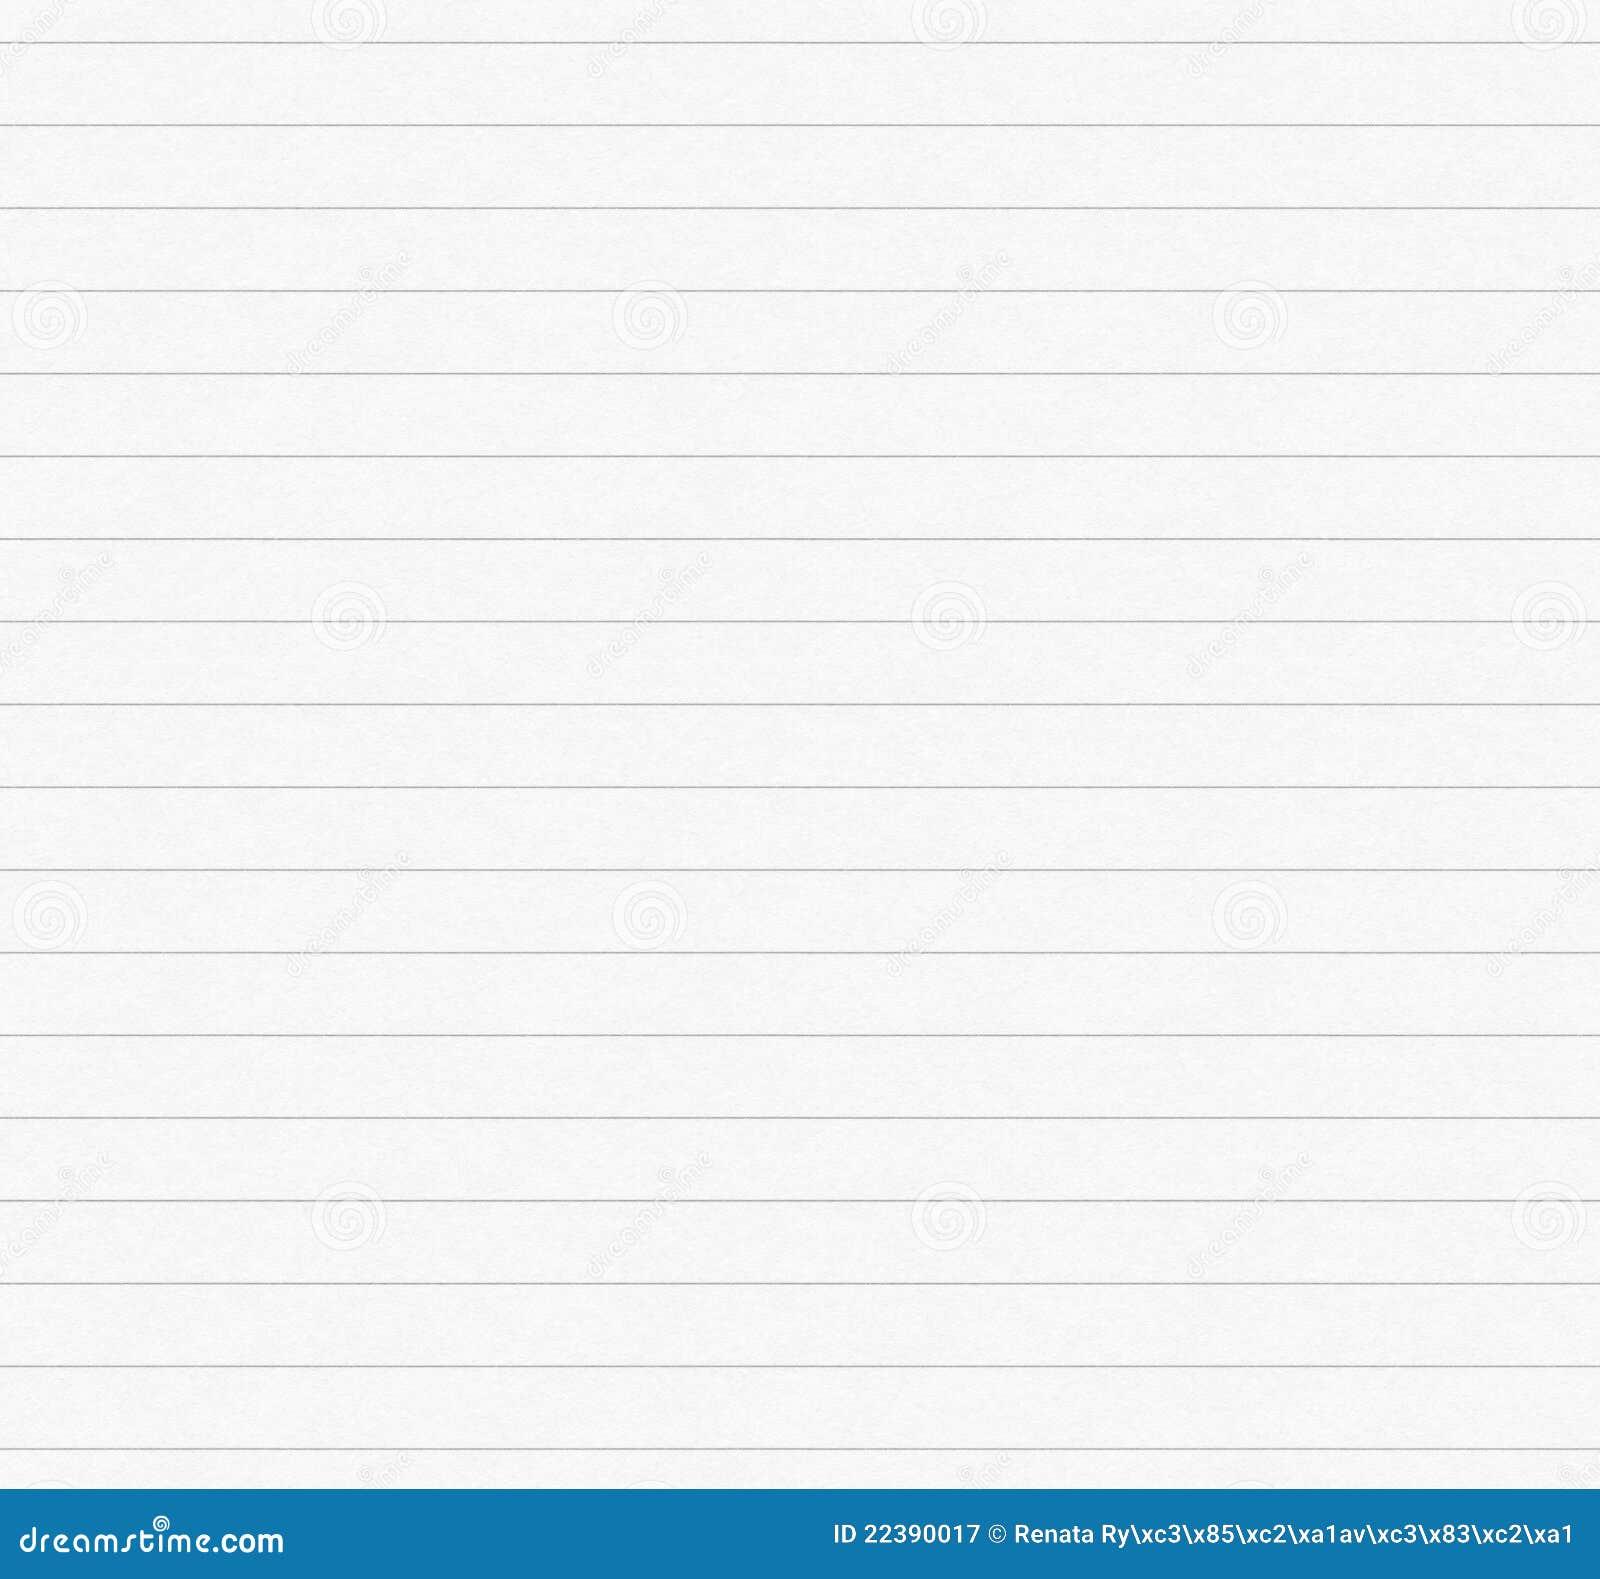 Doc24803508 Download Lined Paper Printable Lined Paper JPG – Printable Loose Leaf Paper